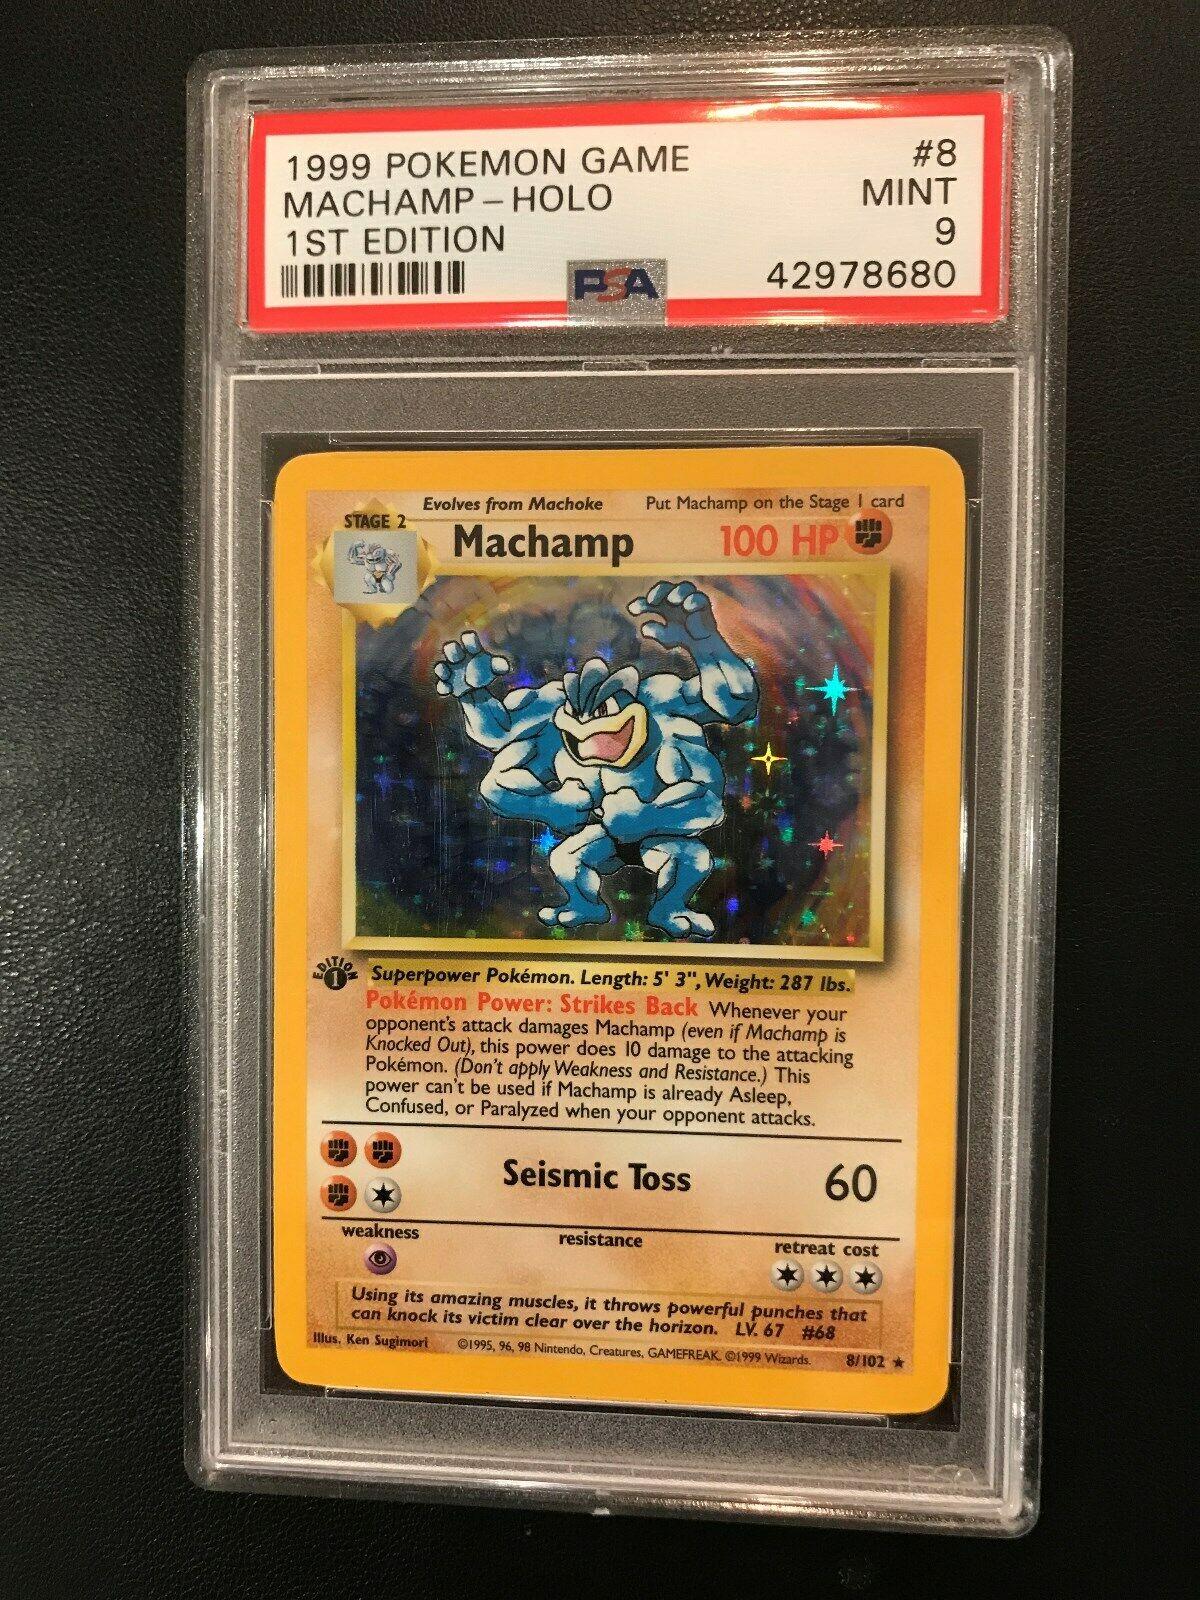 1999 Pokemon Game 1st Edition Machamp 8 HOLO Card PSA 9 Read item description